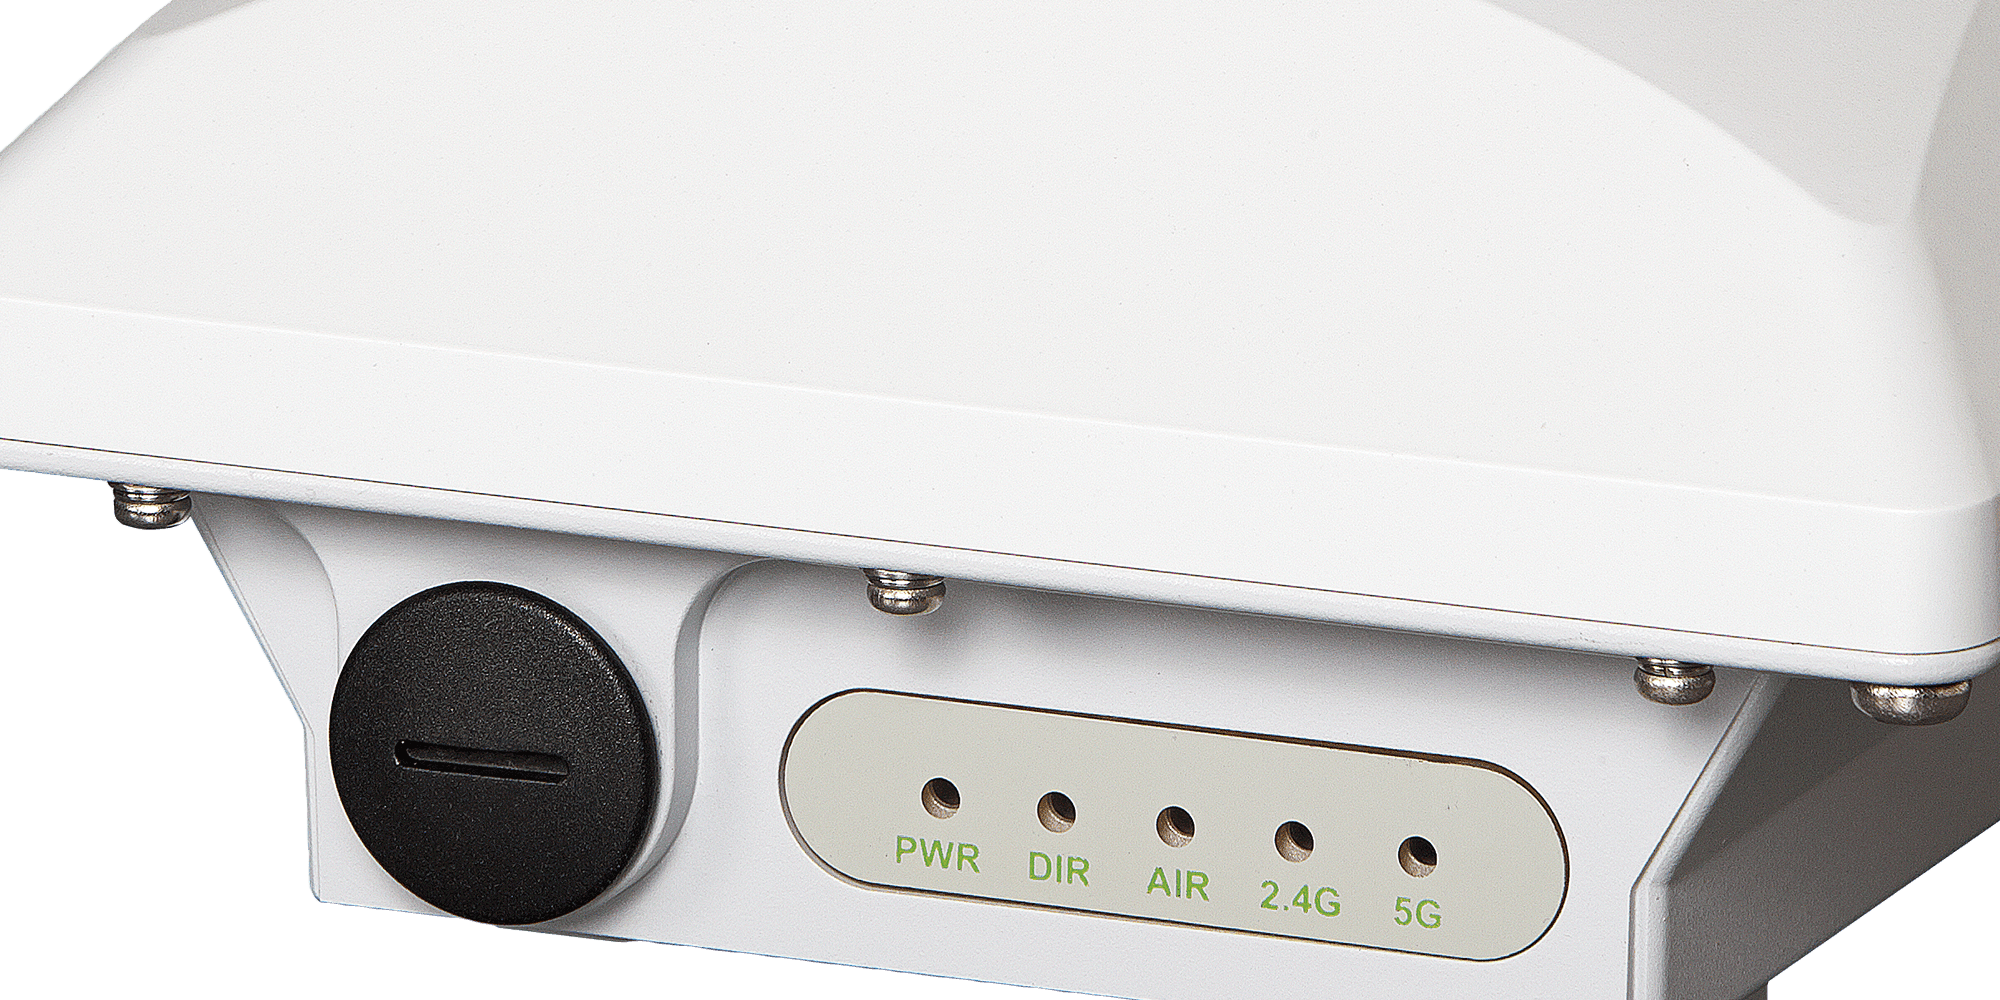 T301 Series